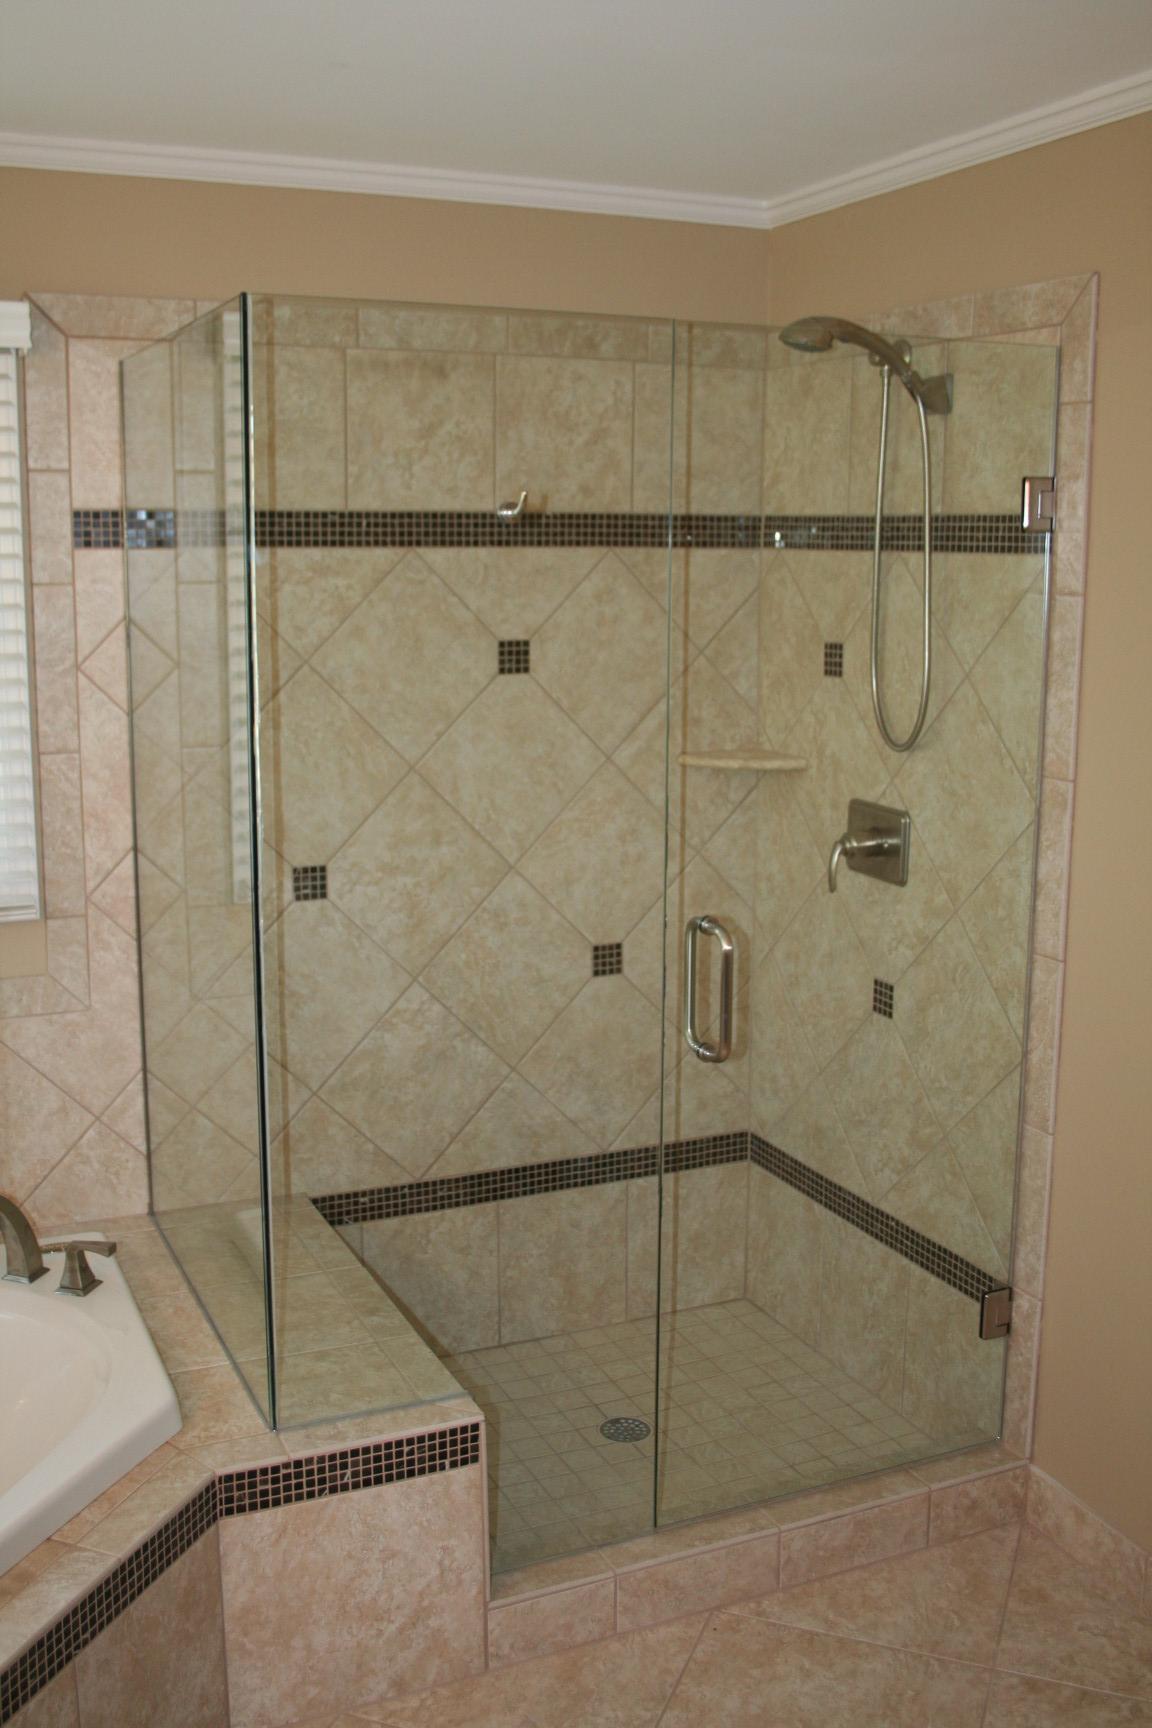 how much is kitchen cabinet installation corner sinks for sale framed vs frameless glass shower doors options | ideas 4 homes